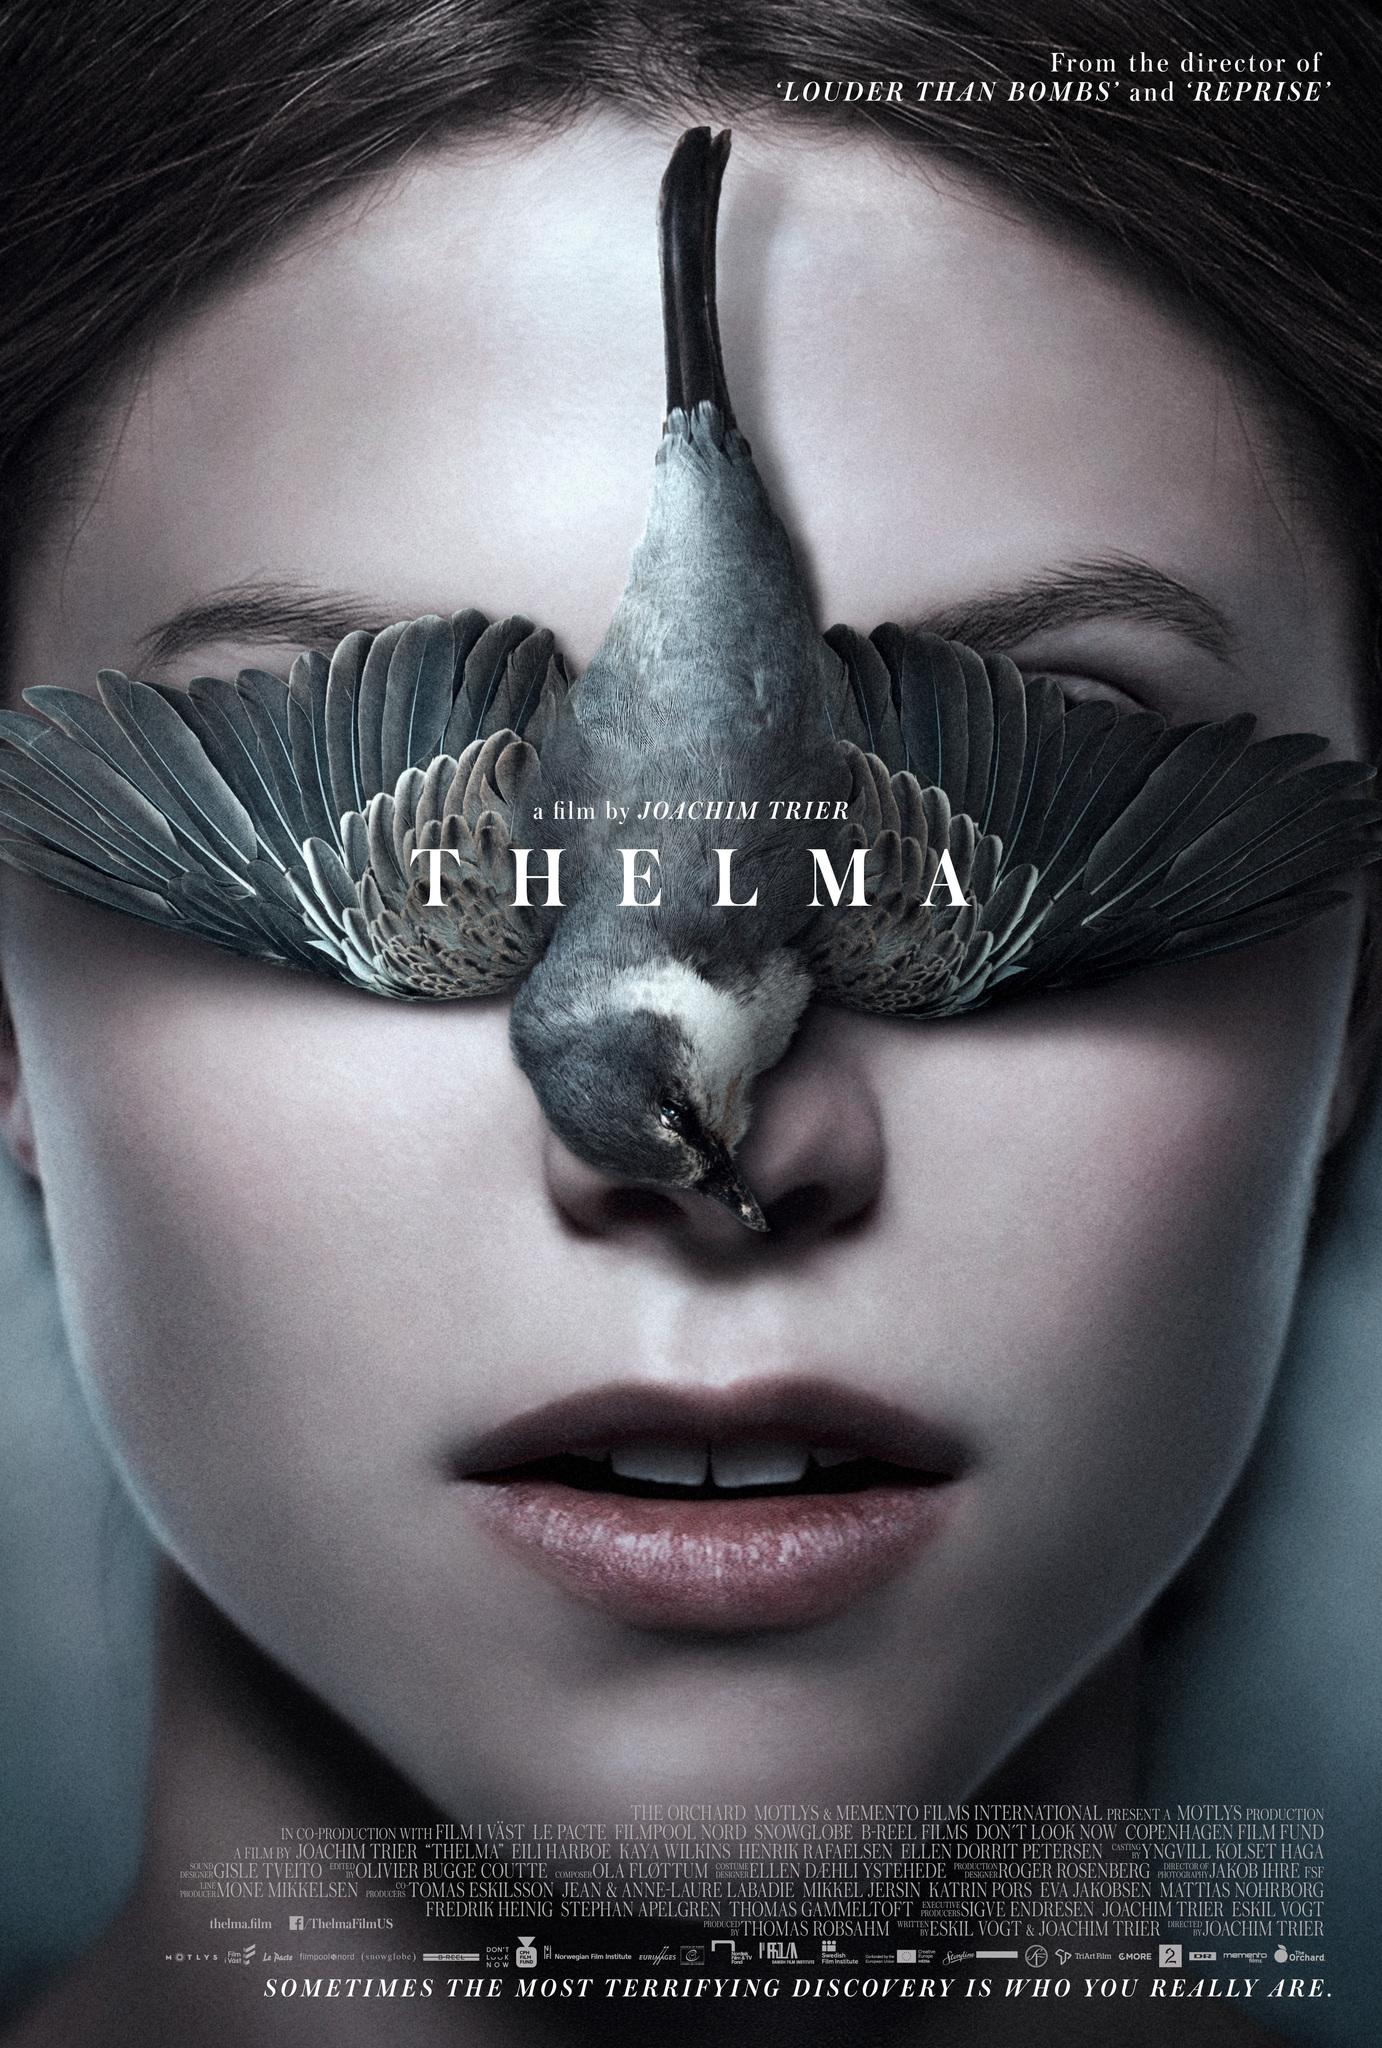 thelma_poster_1.jpg